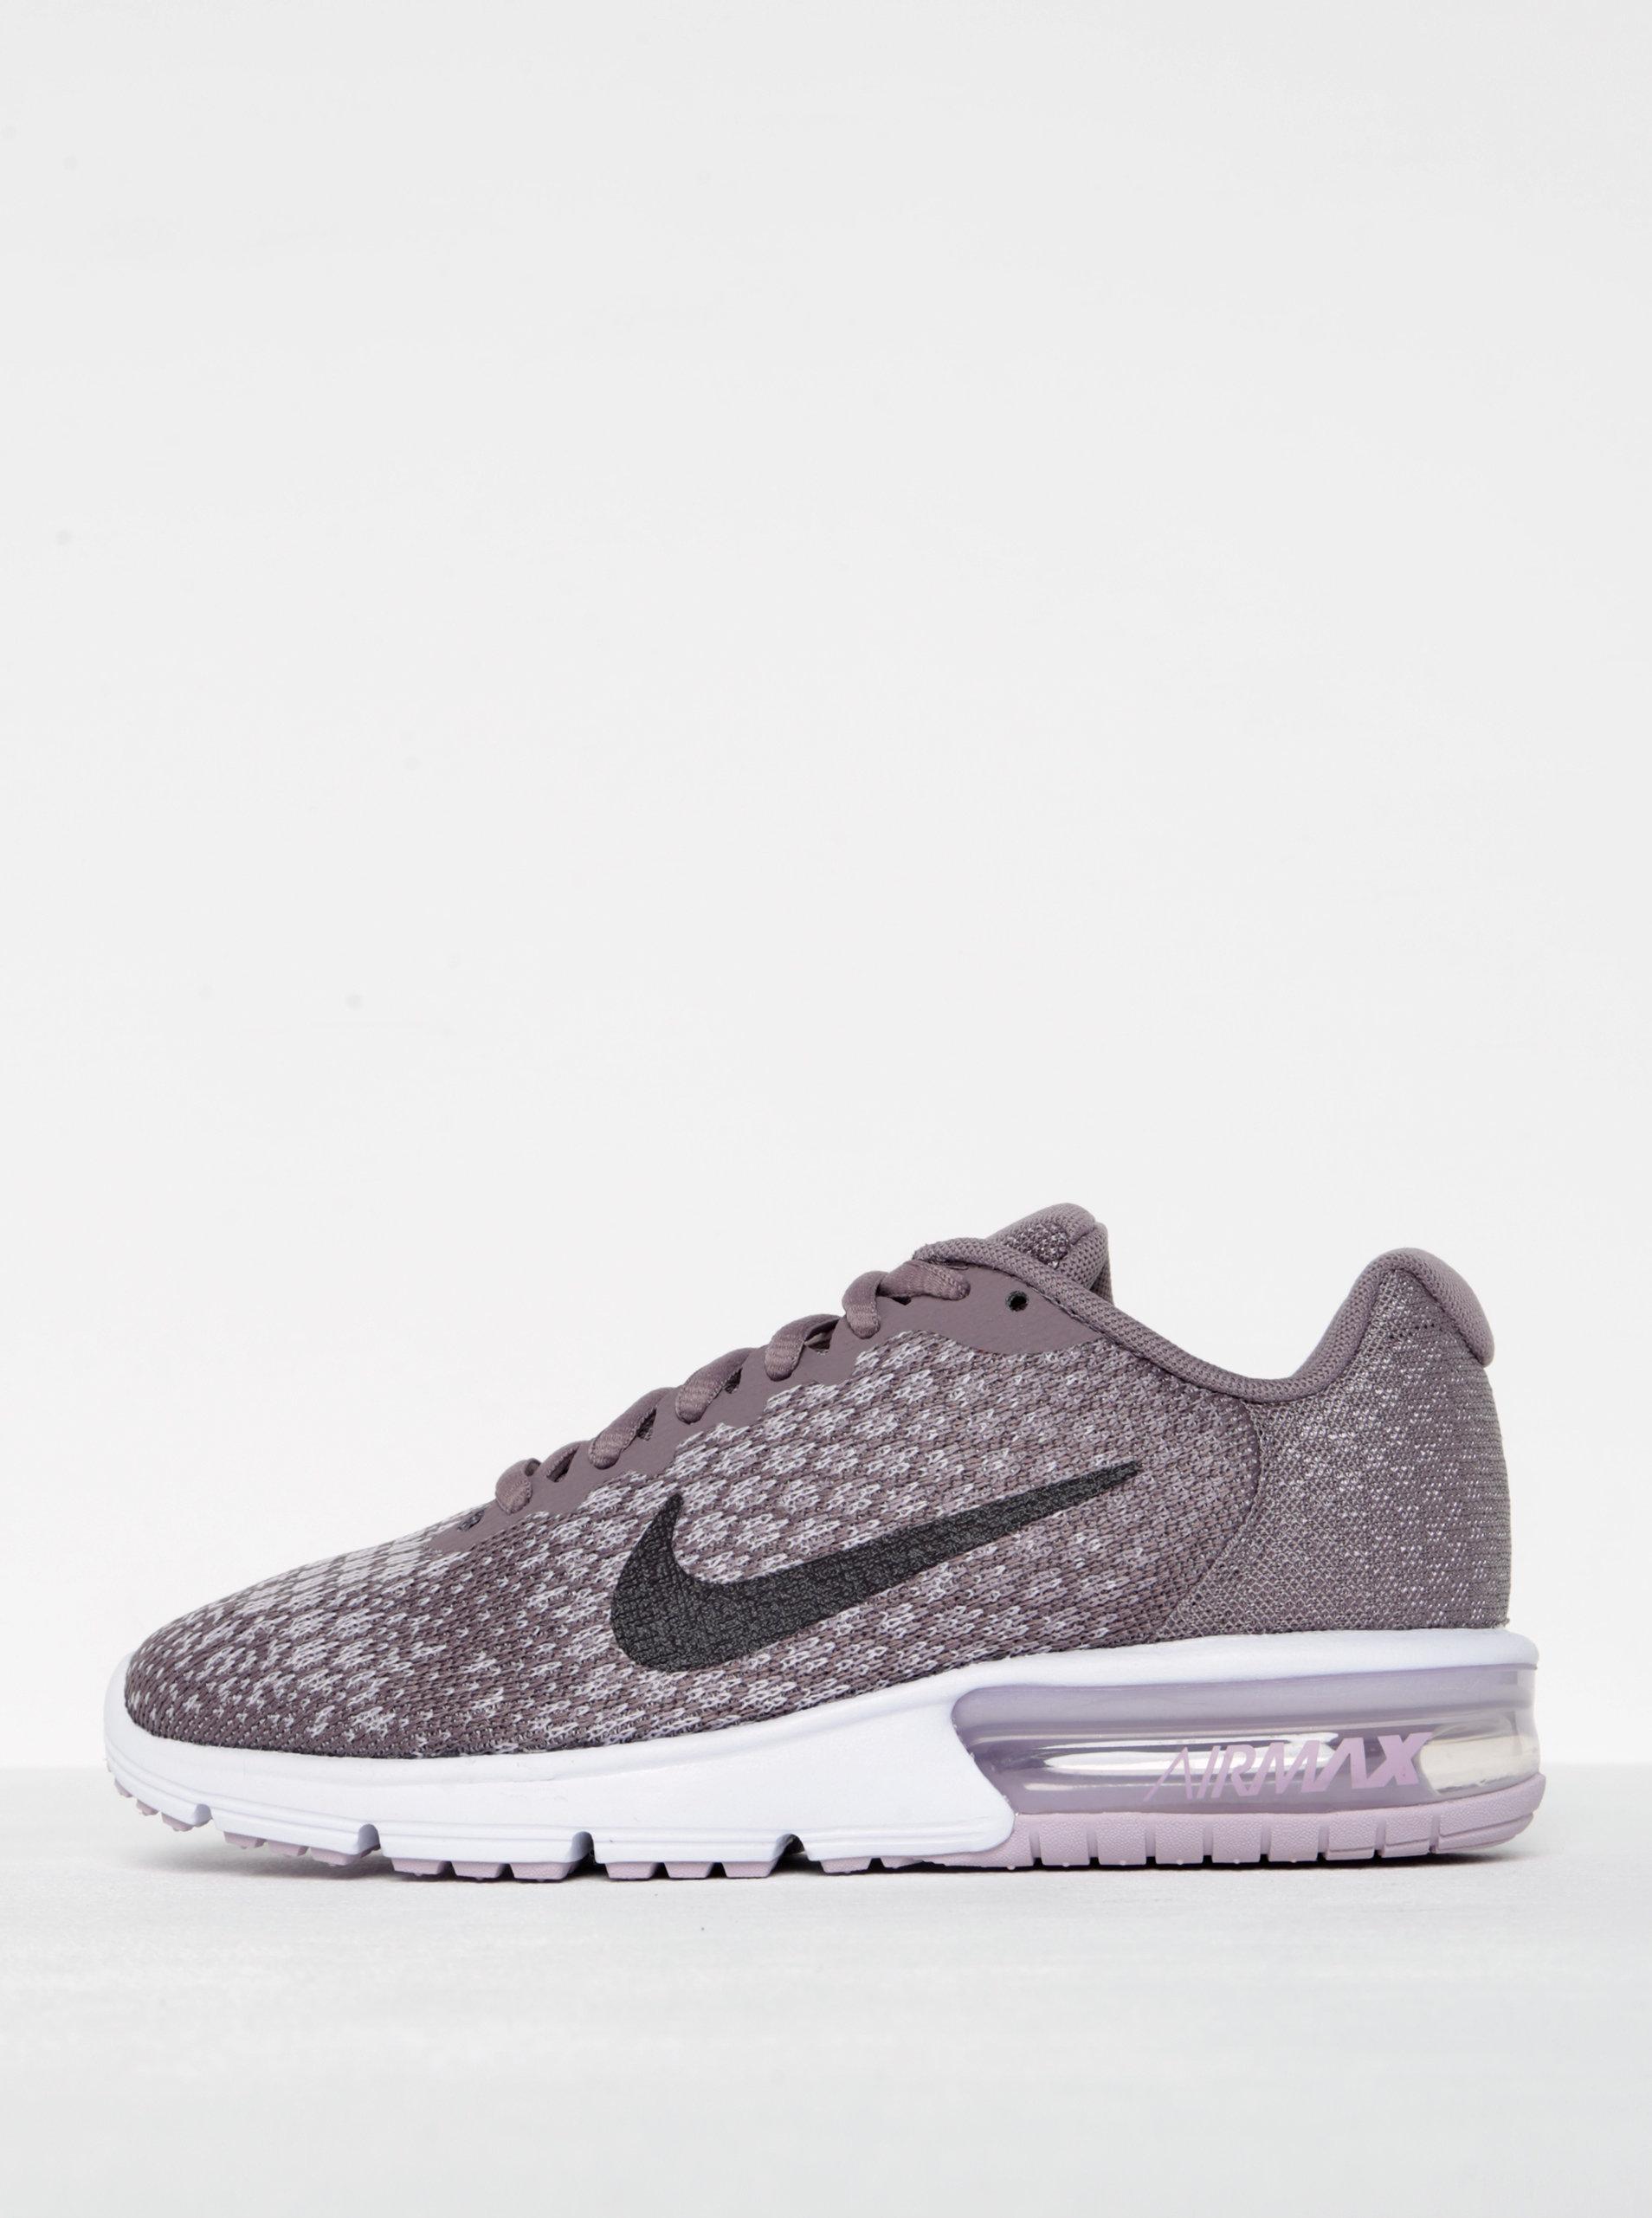 Světle fialové dámské tenisky Nike Air Max Sequent 2 ... 659b2b9258